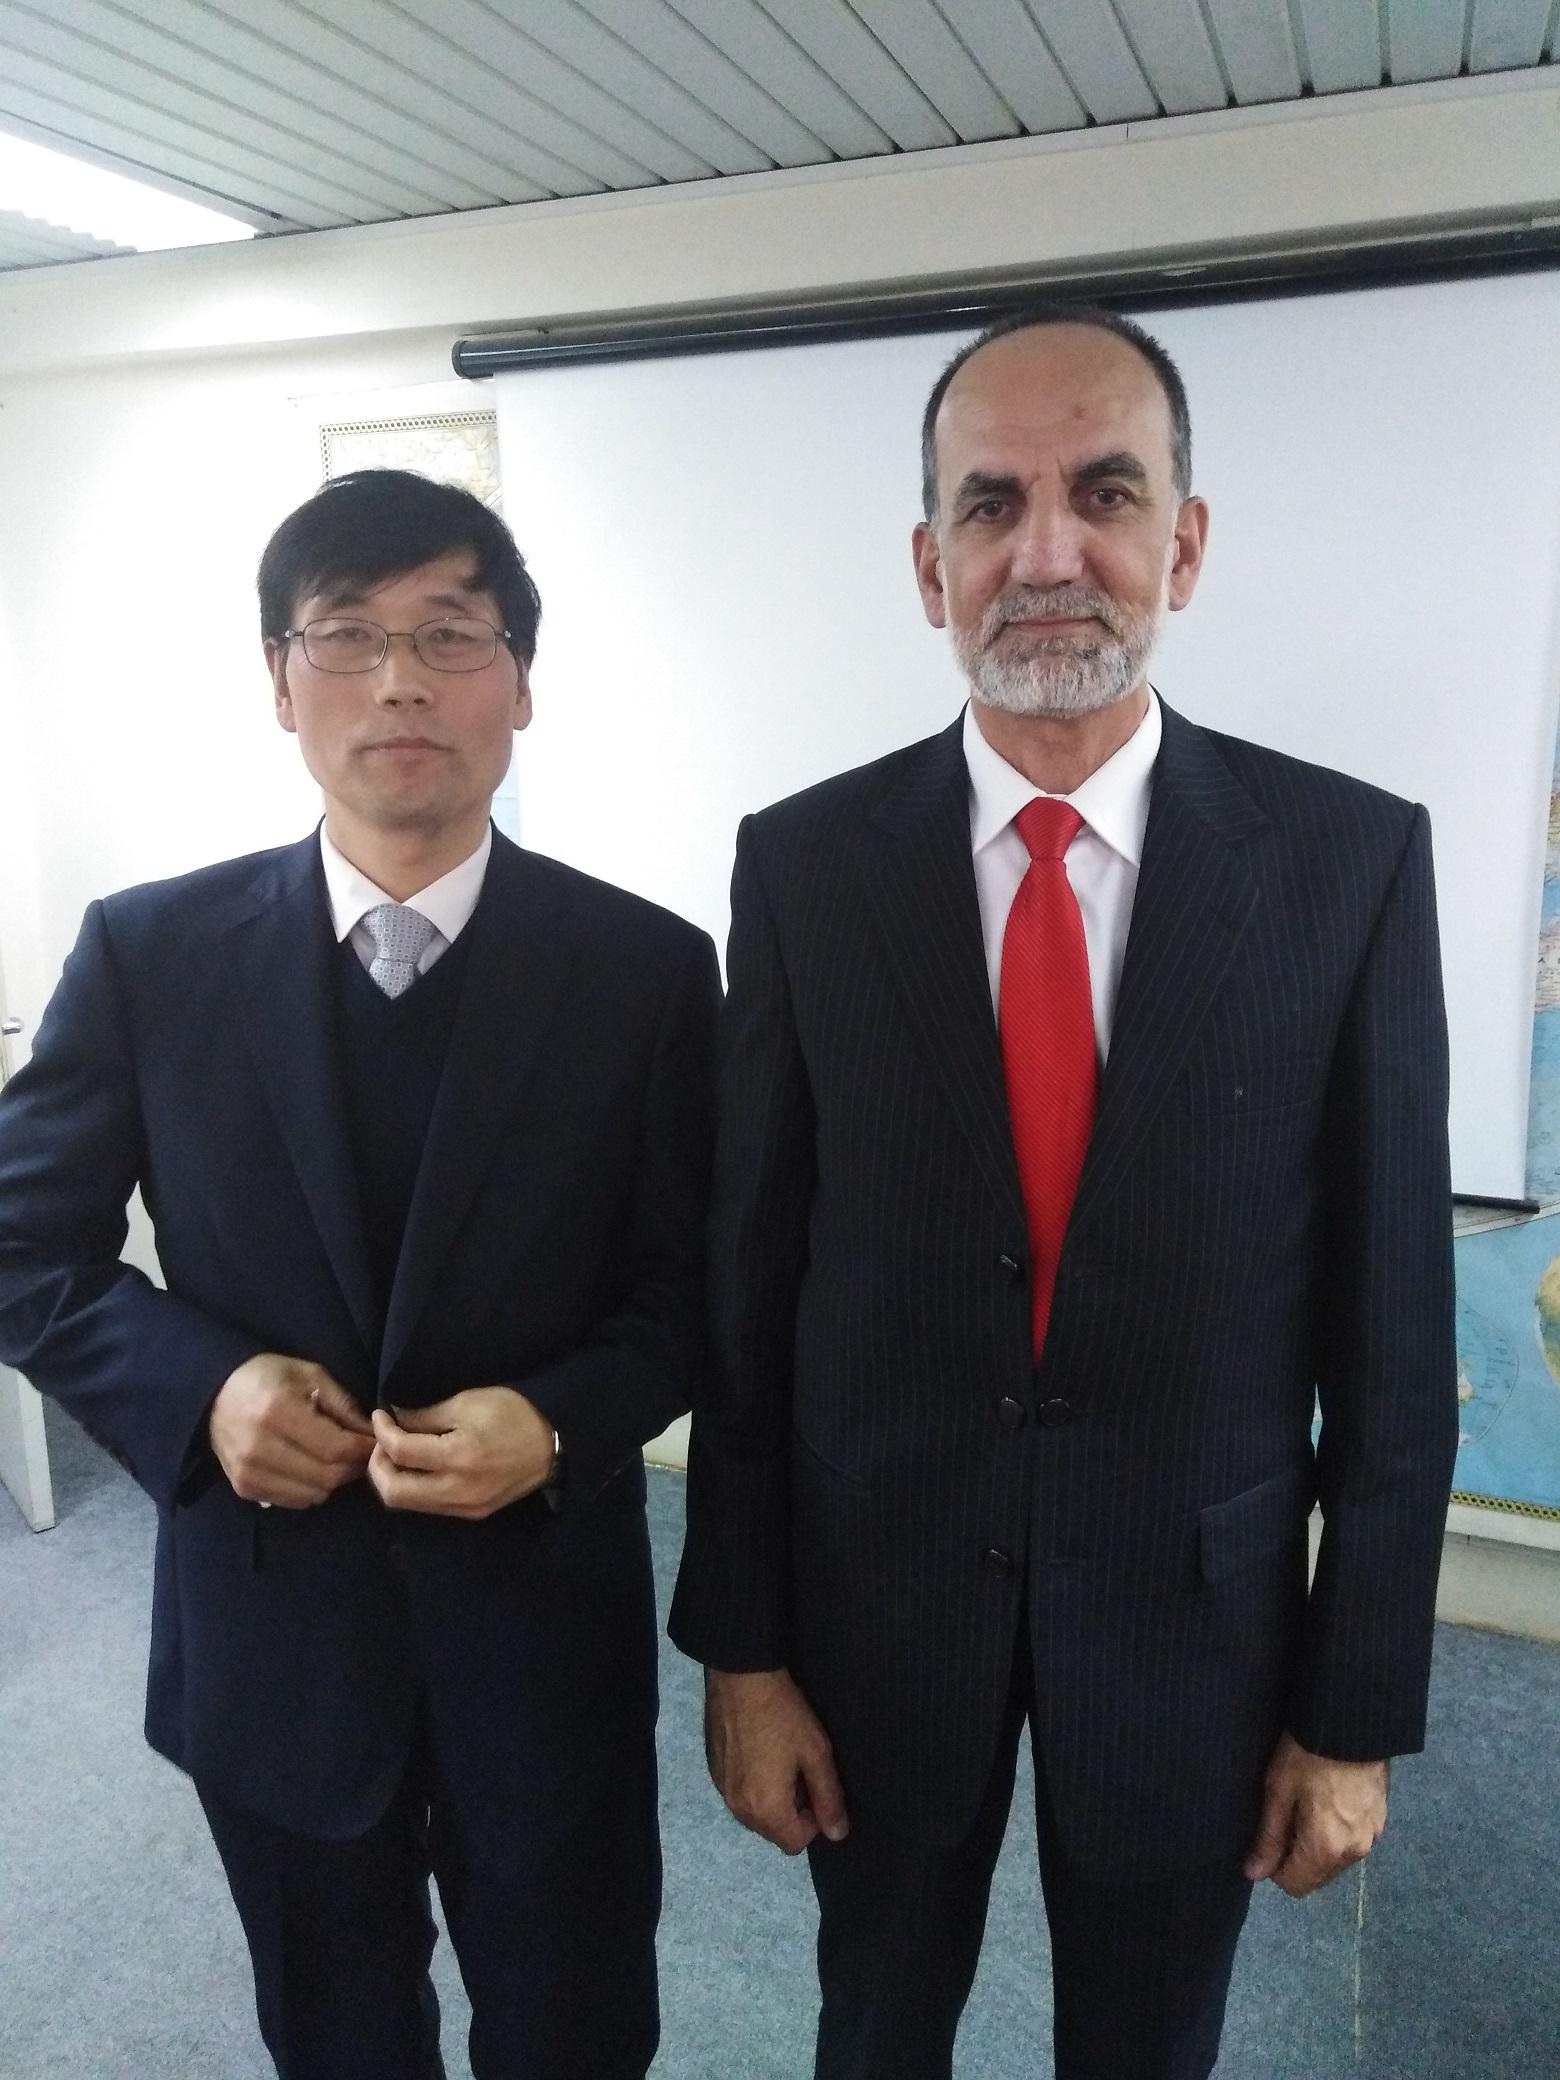 Dr. Zahid Anwar